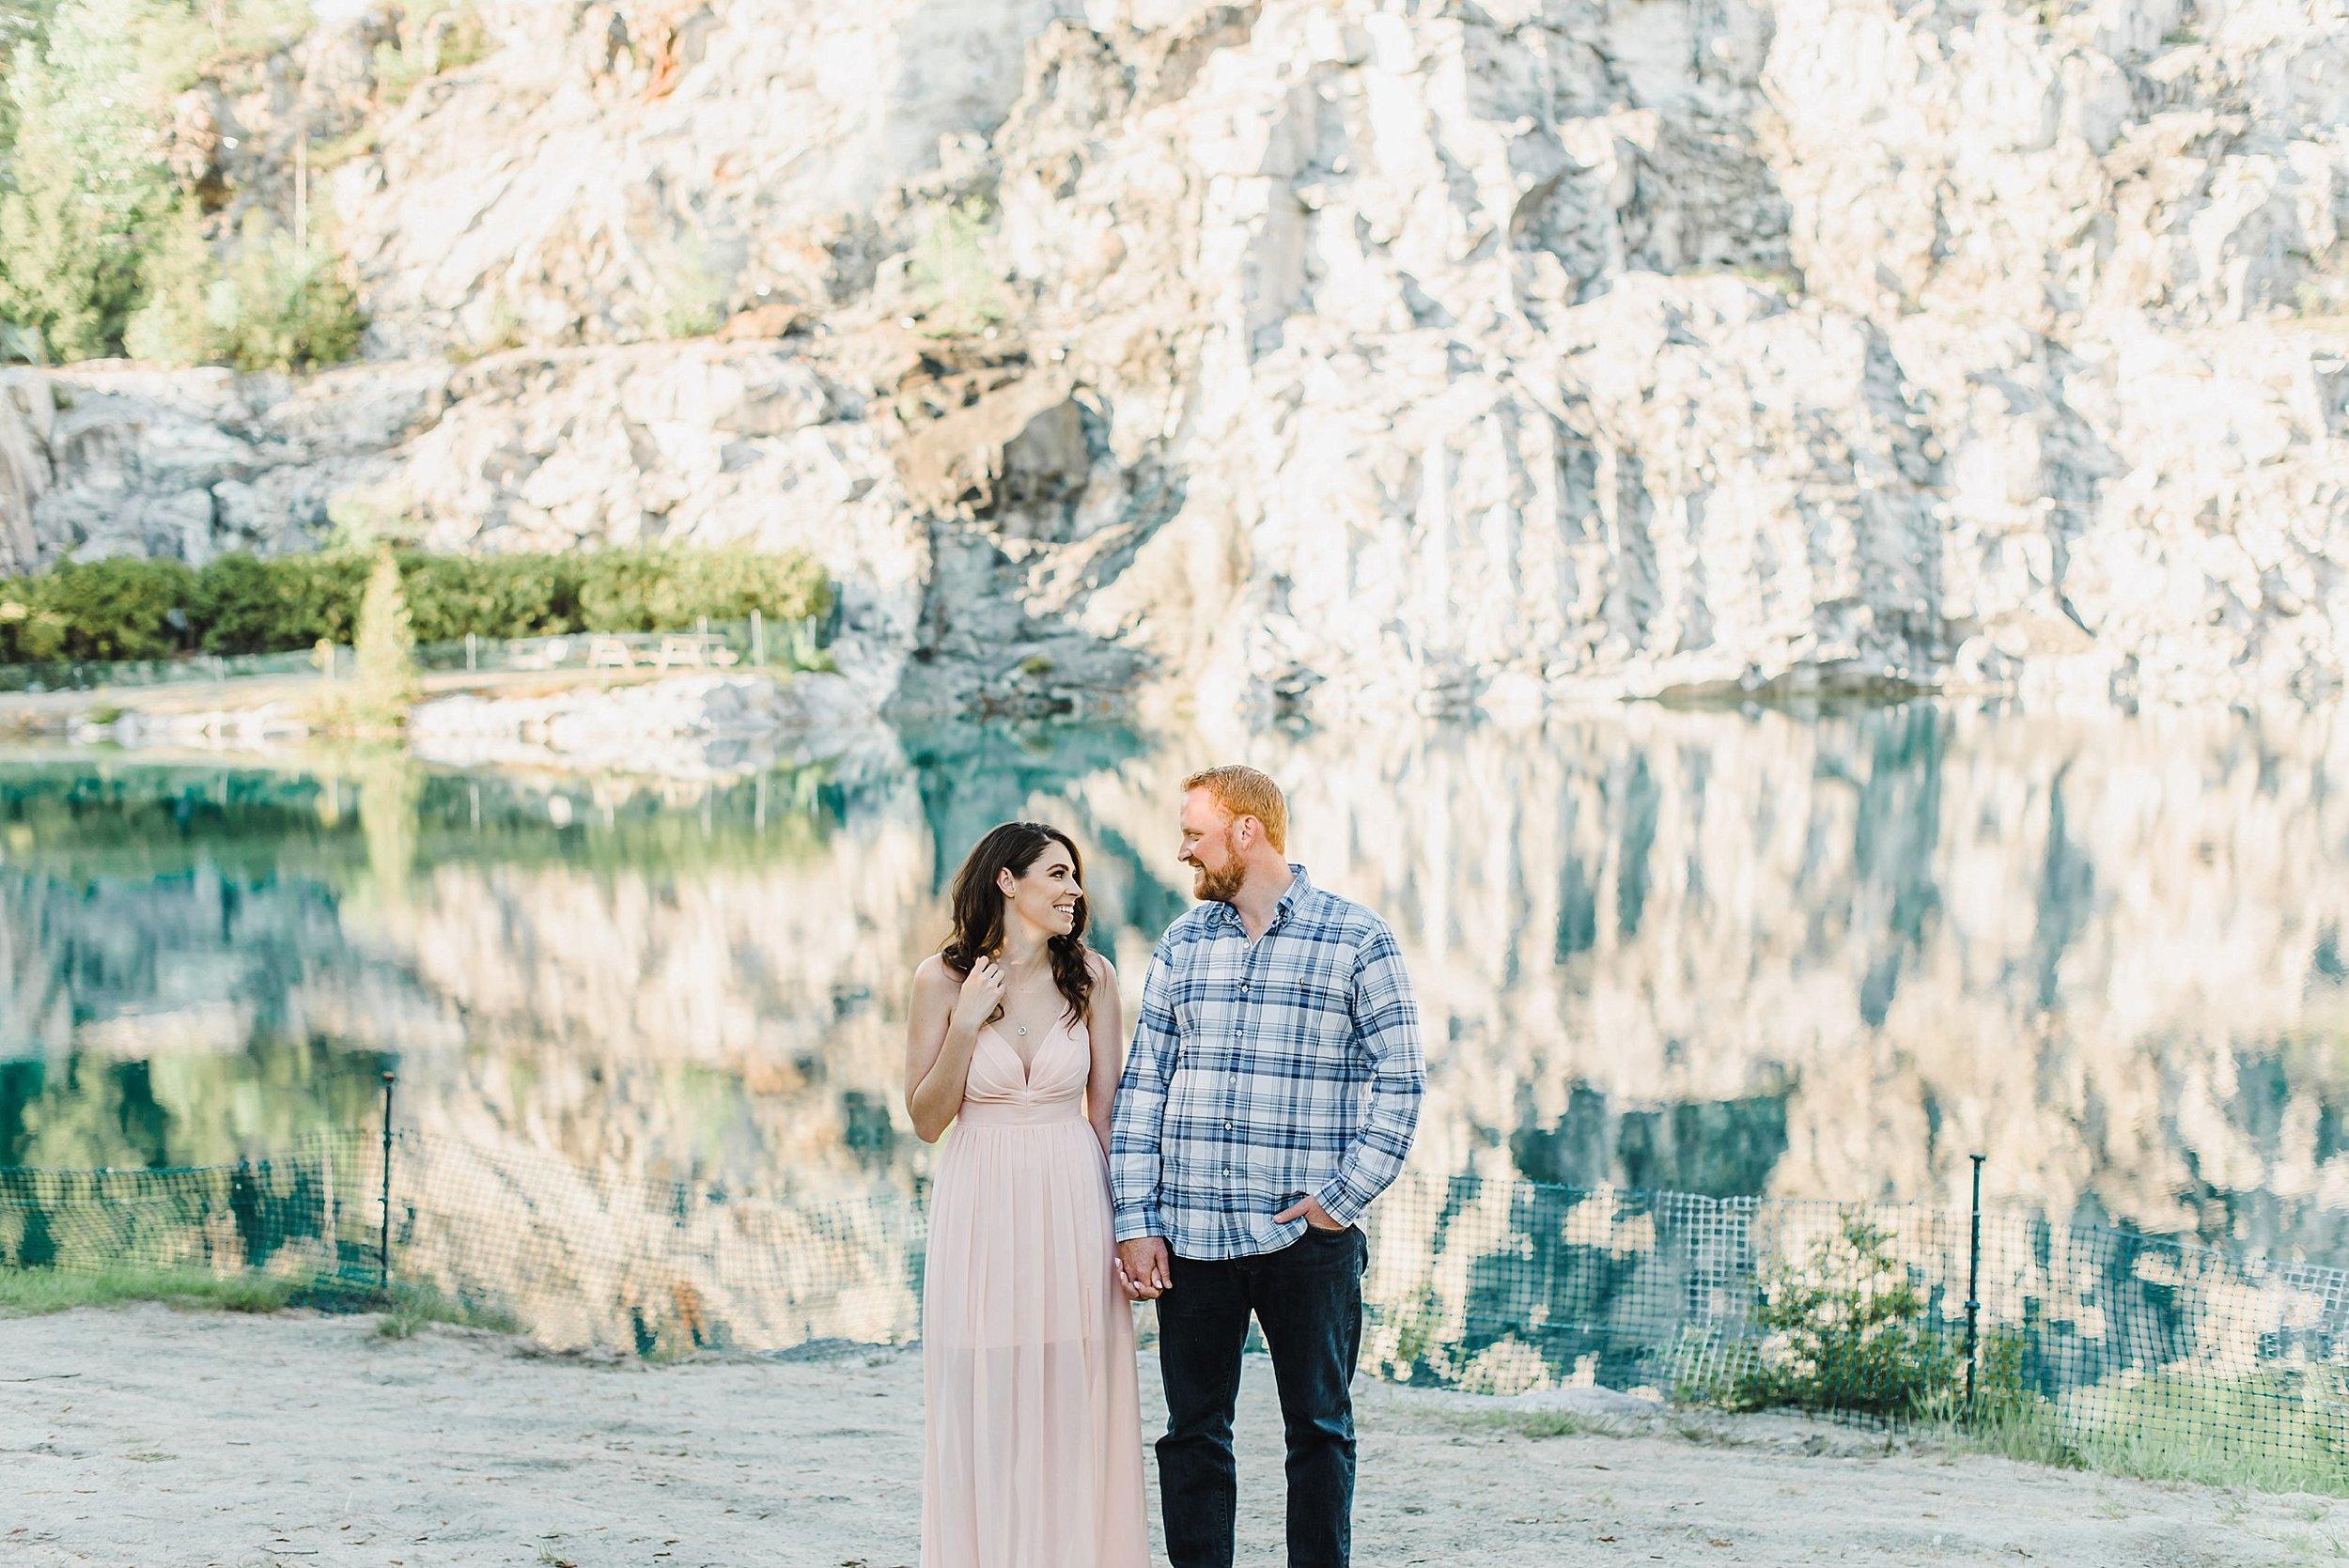 light airy indie fine art ottawa wedding photographer | Ali and Batoul Photography_0642.jpg